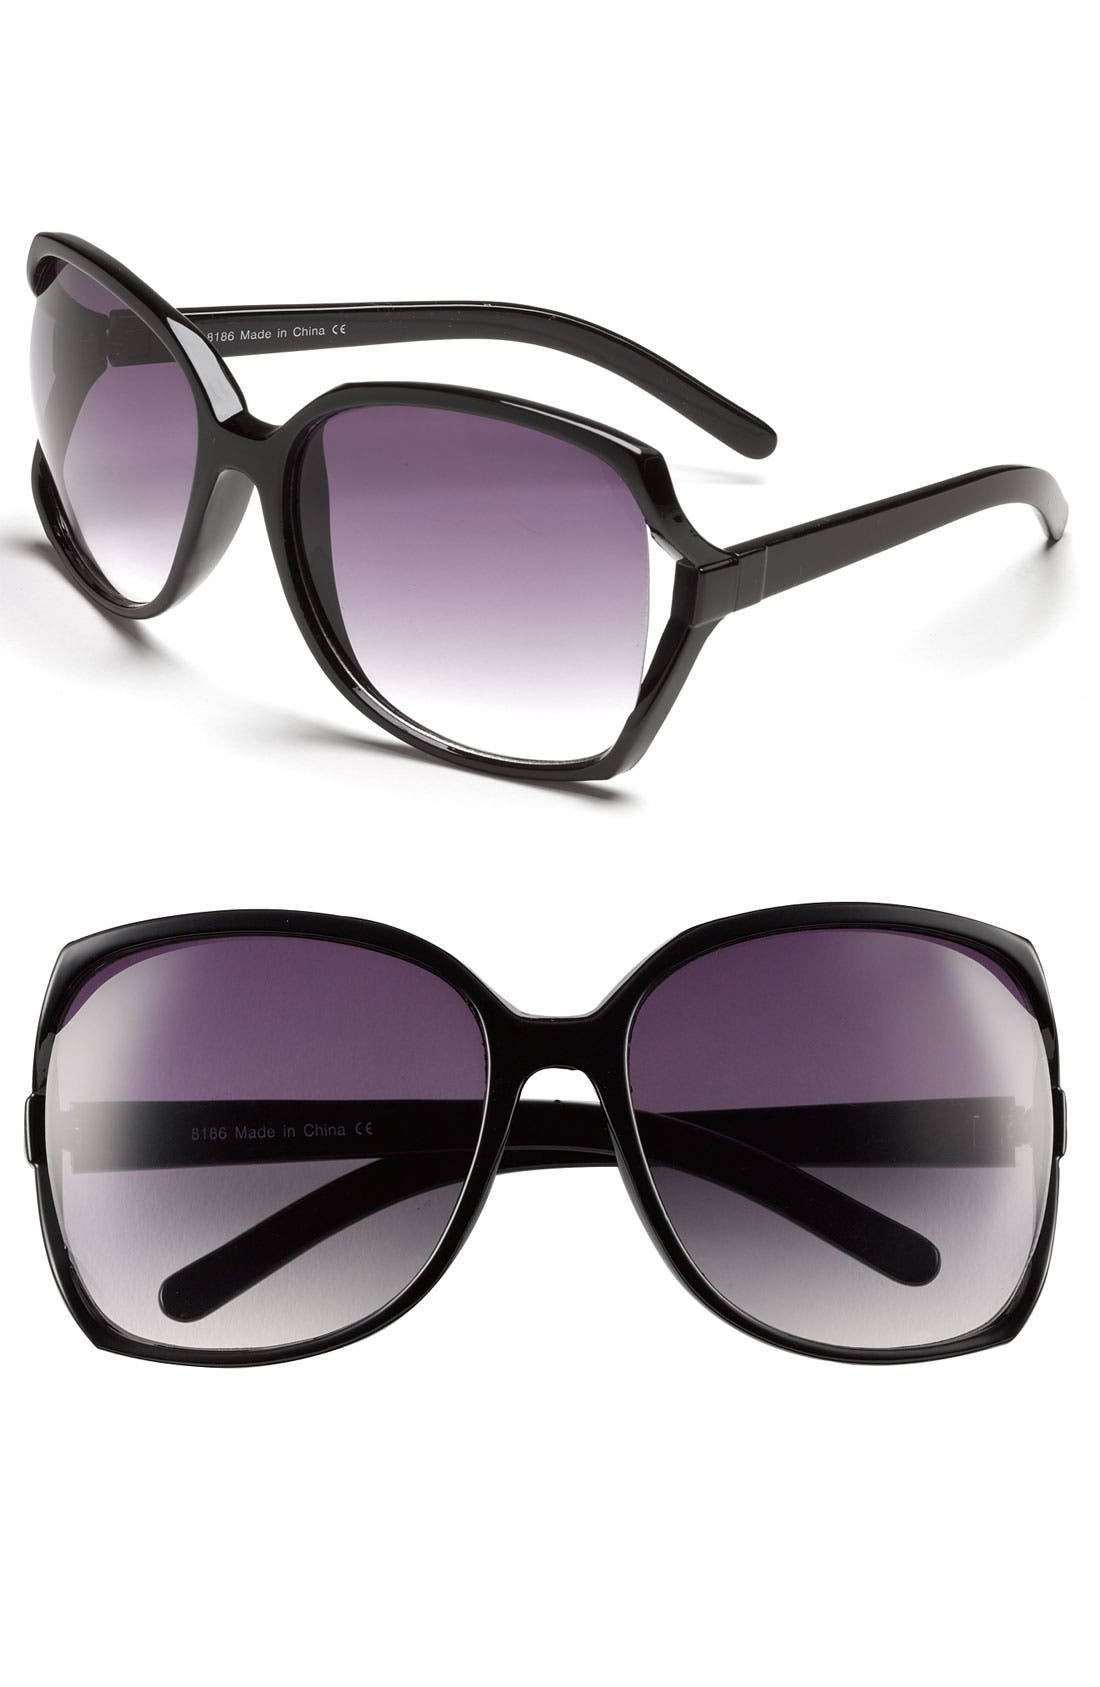 Main Image - KW 'Nicole' Oversized Frame Sunglasses (Juniors)